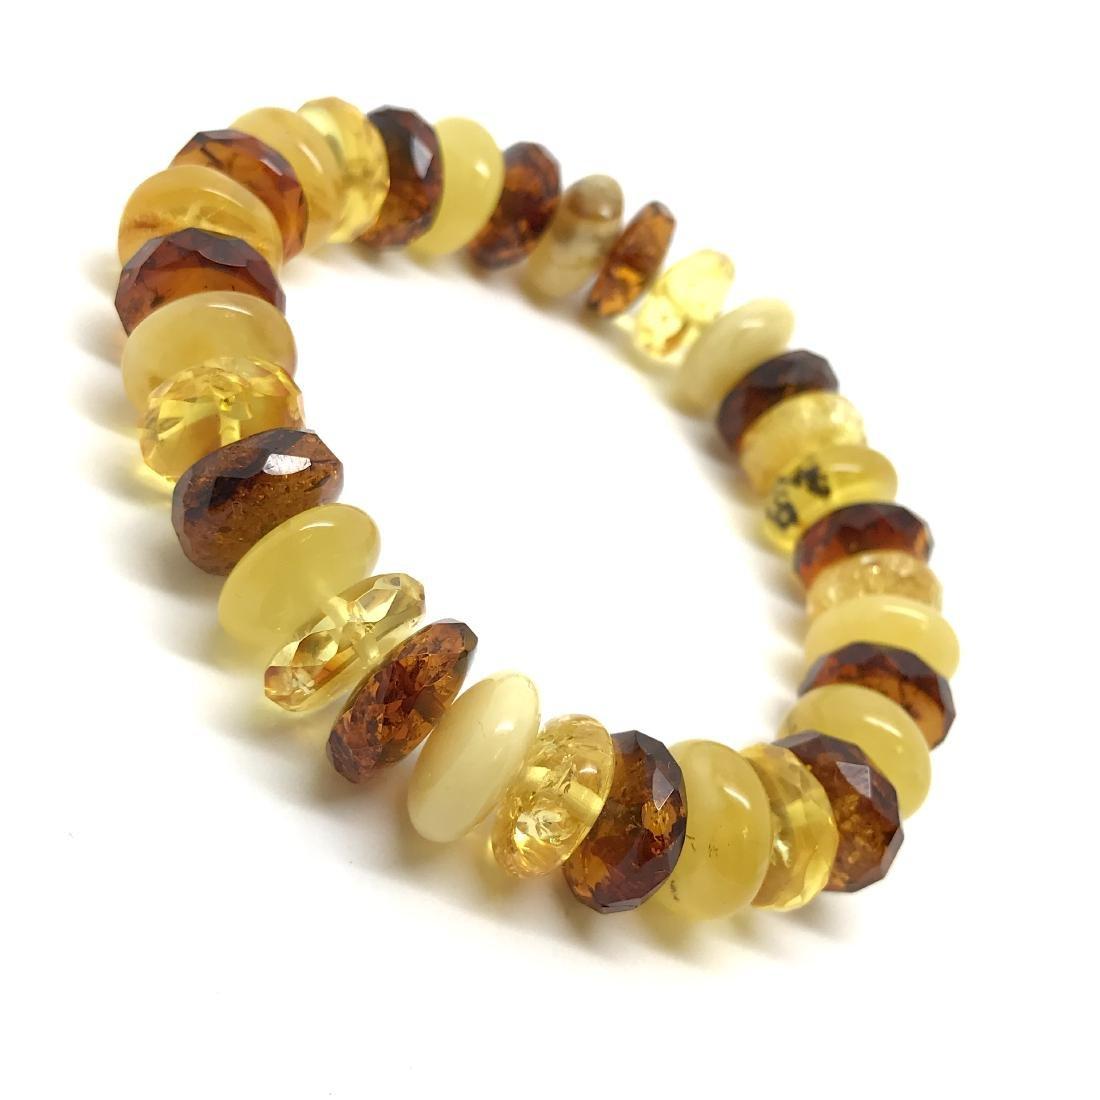 Vintage bracelet Baltic amber faceted doughnuts various - 4